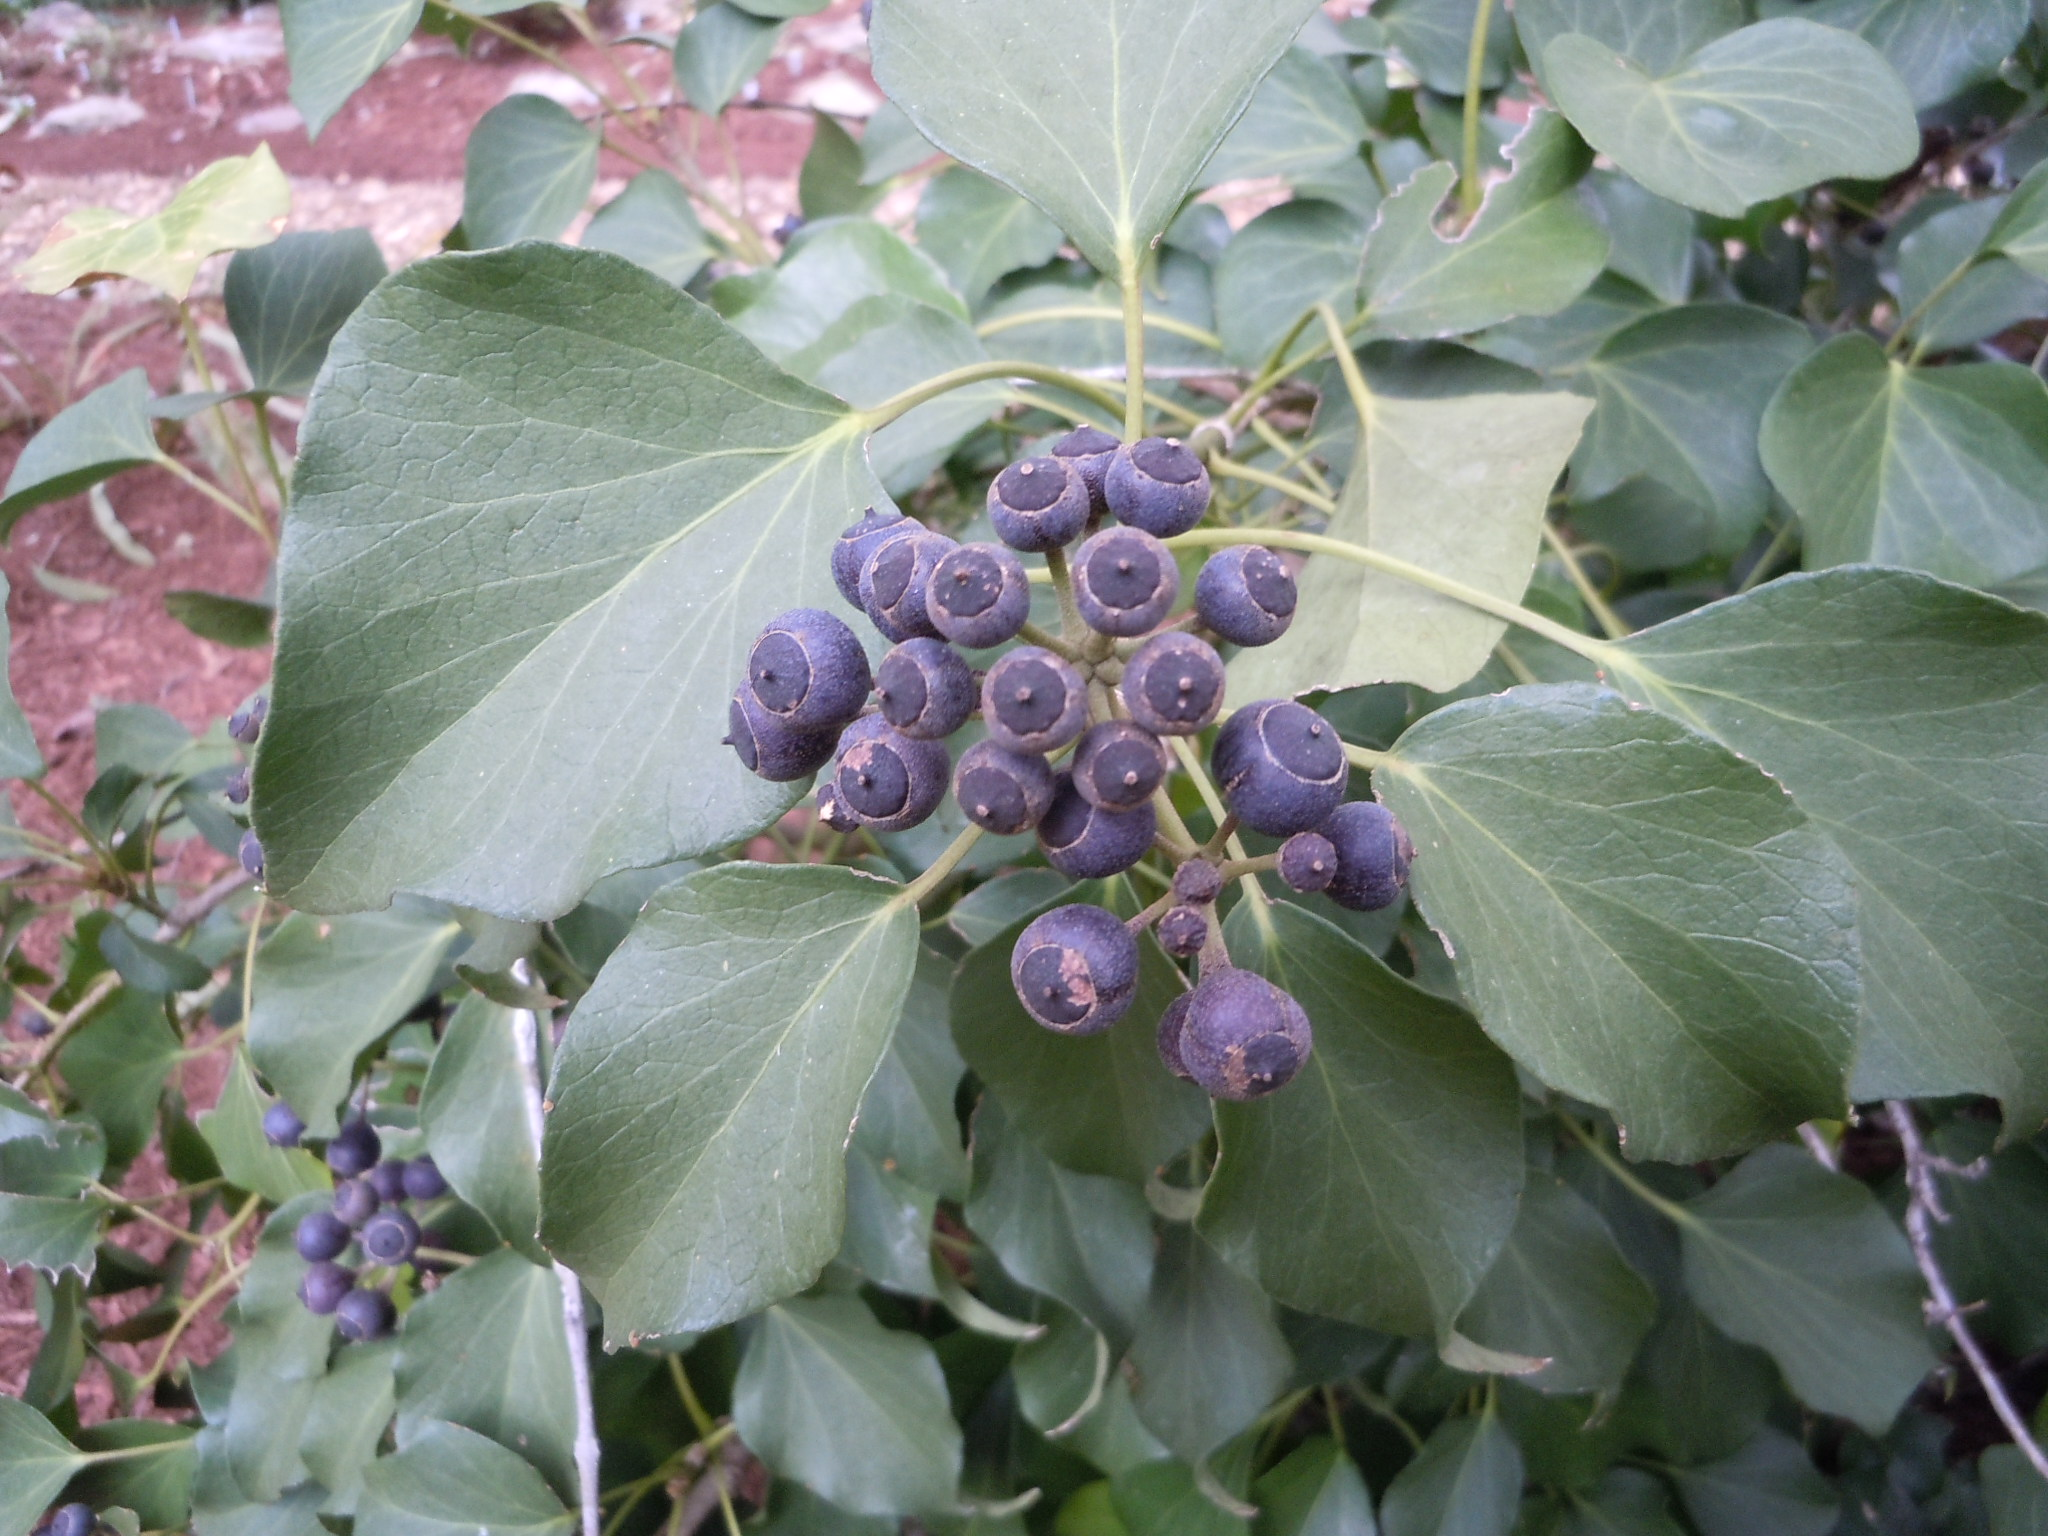 English ivy berries 2